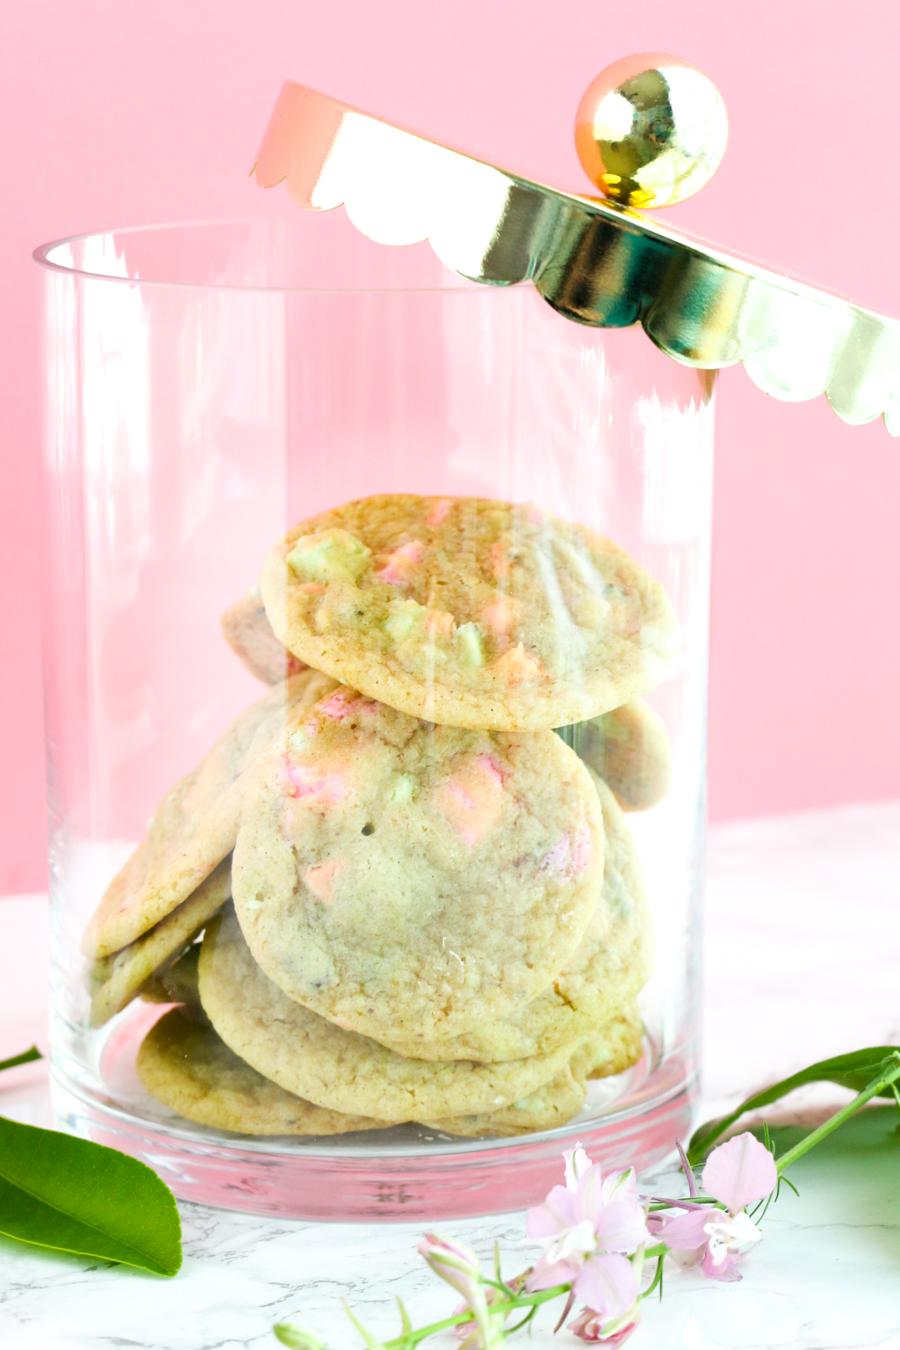 Pastel Candy Makeup Tutorial: Pastel Chocolate Chip Cookies